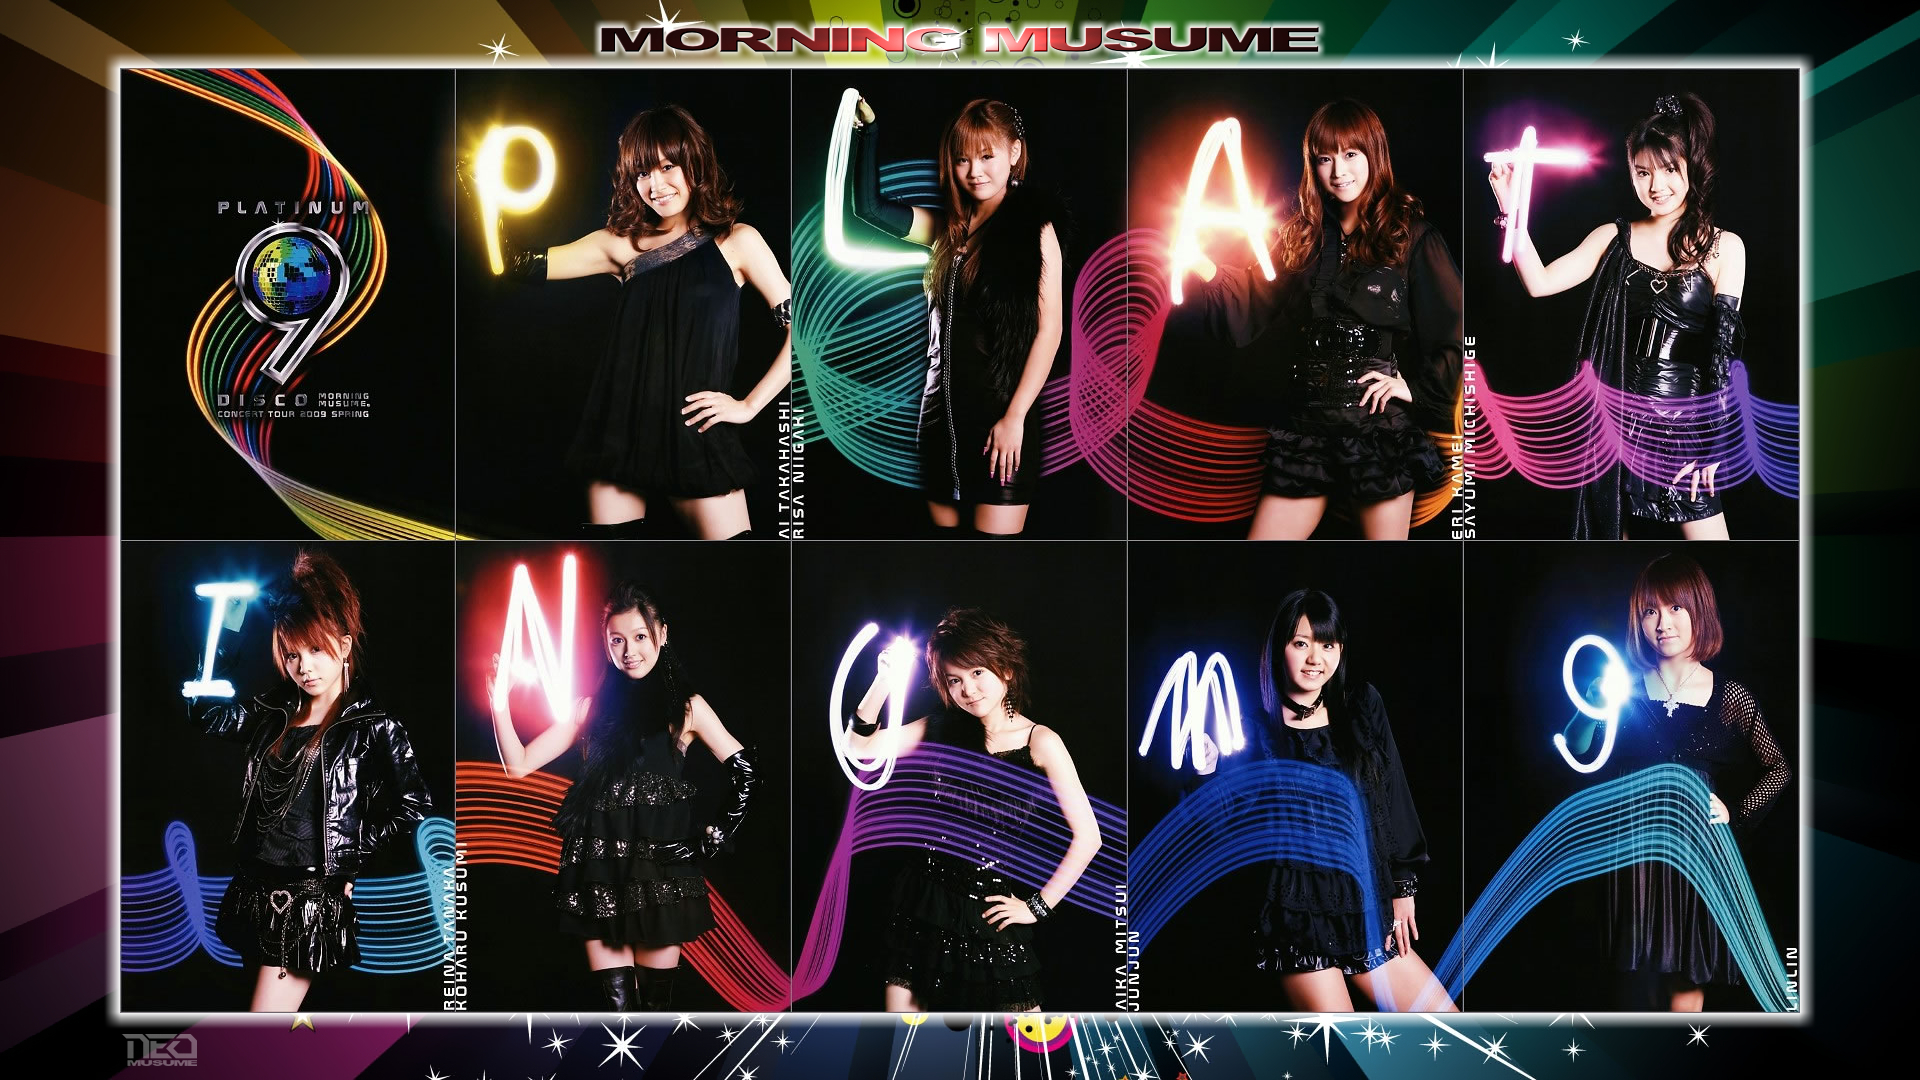 Morning Musume Platinum 9 by NEO-Musume